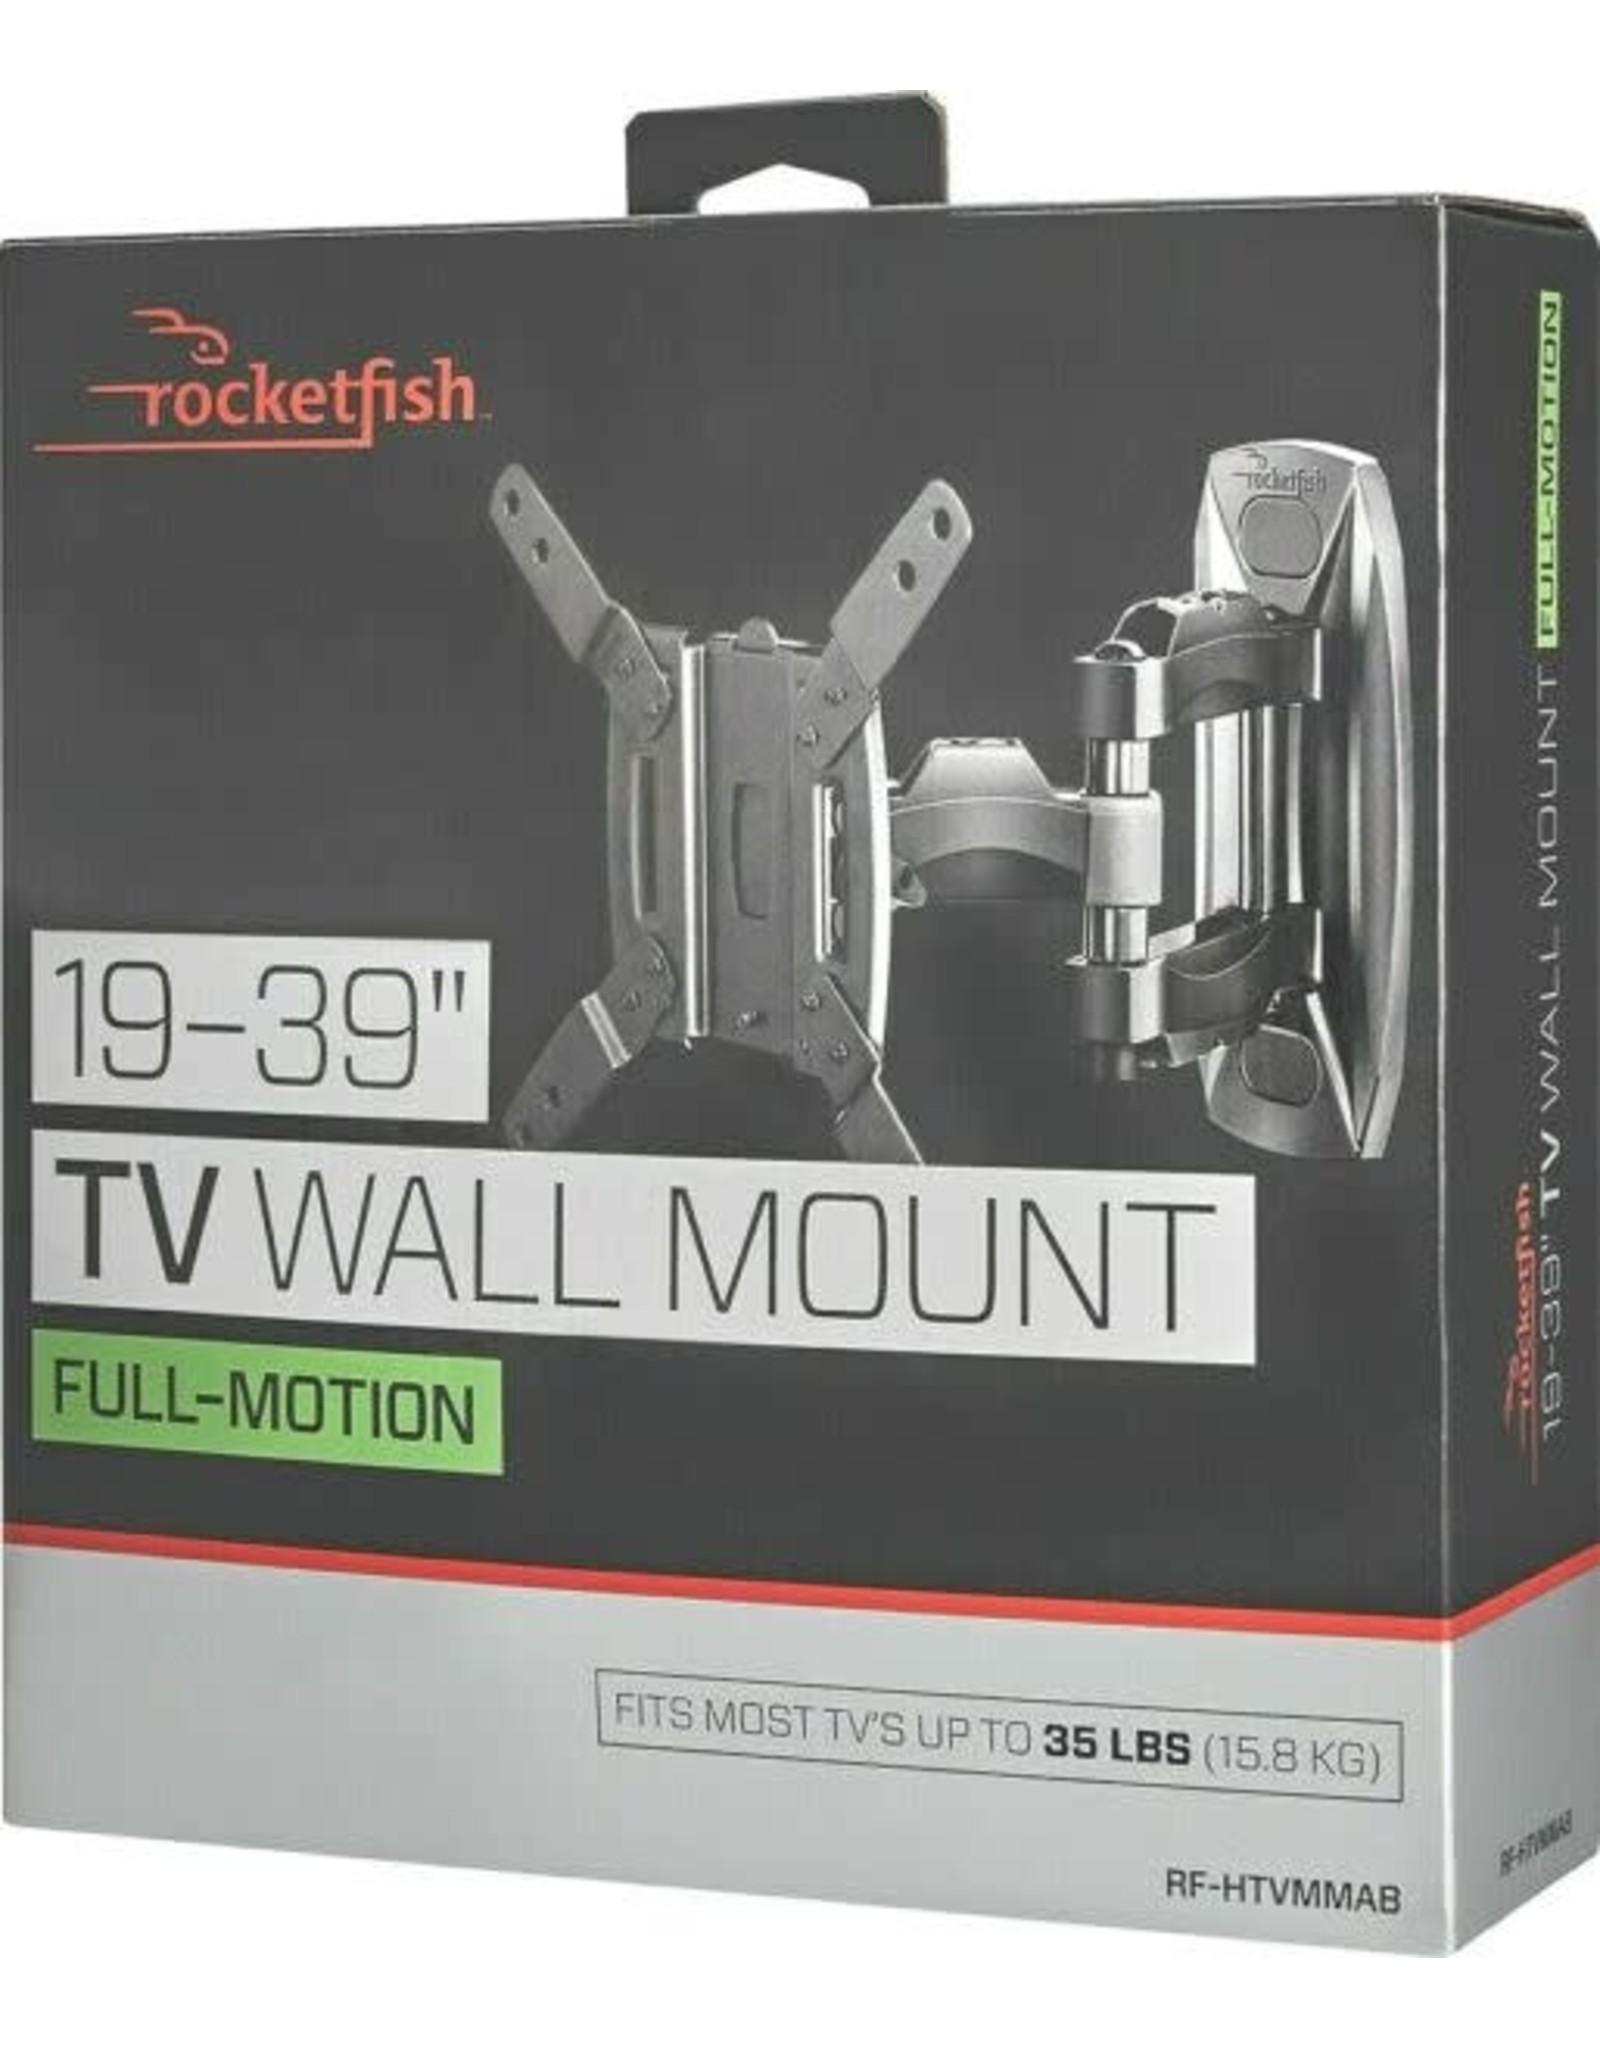 "Rocketfish™ Rocketfish™ - Full-Motion TV Wall Mount for Most 19"" - 39"" TVs - Black"